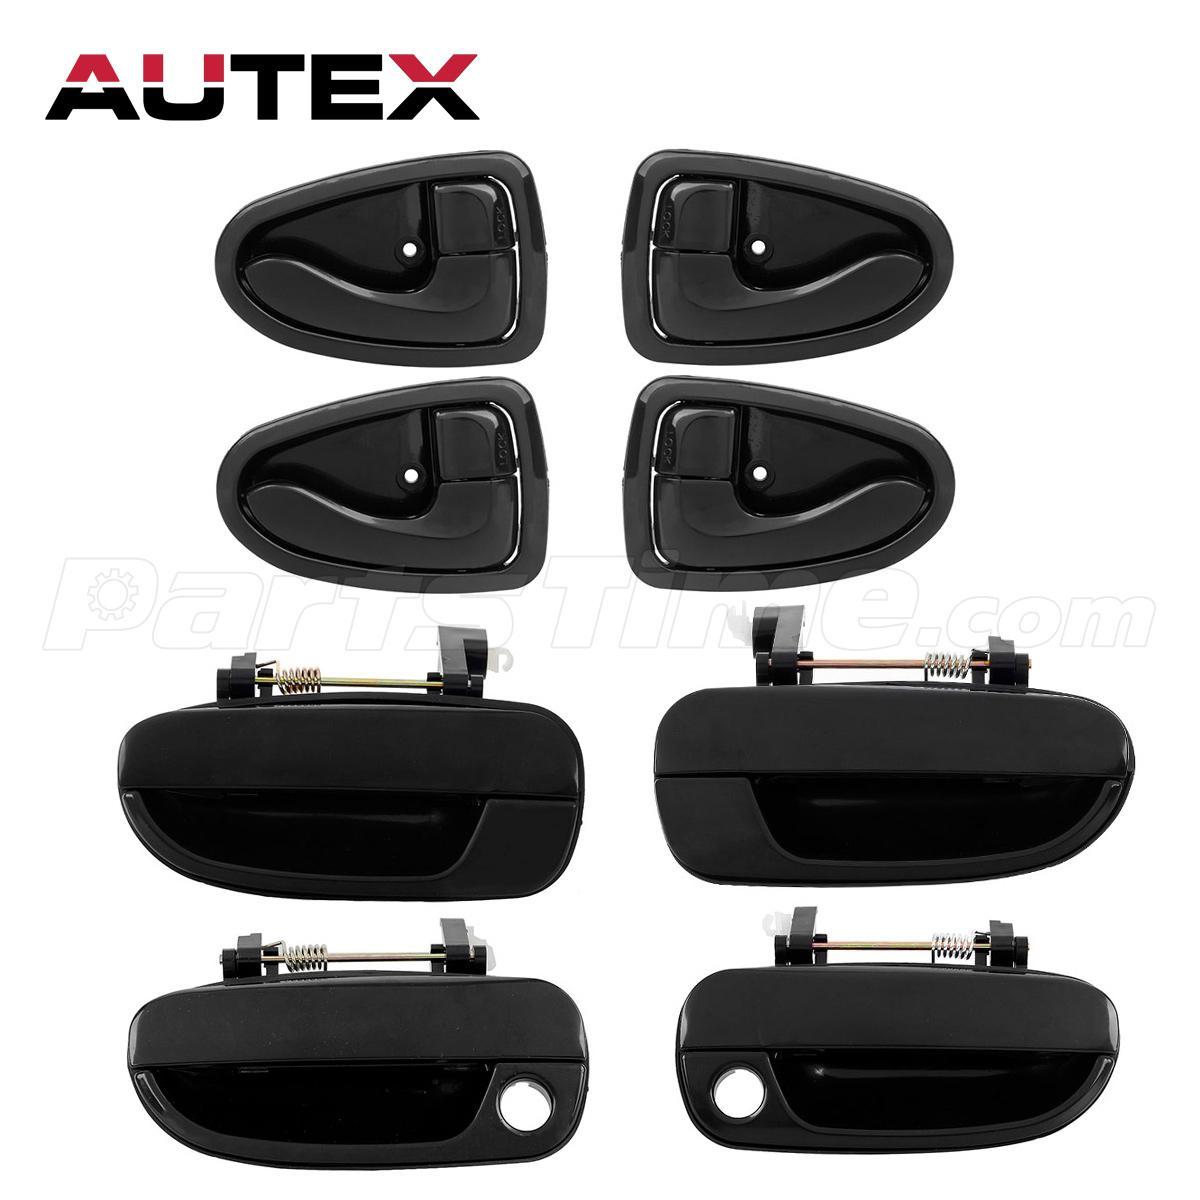 Set of 8 black plastic car front rear door handles for 2000 2005 hyundai accent Hyundai accent exterior door handle